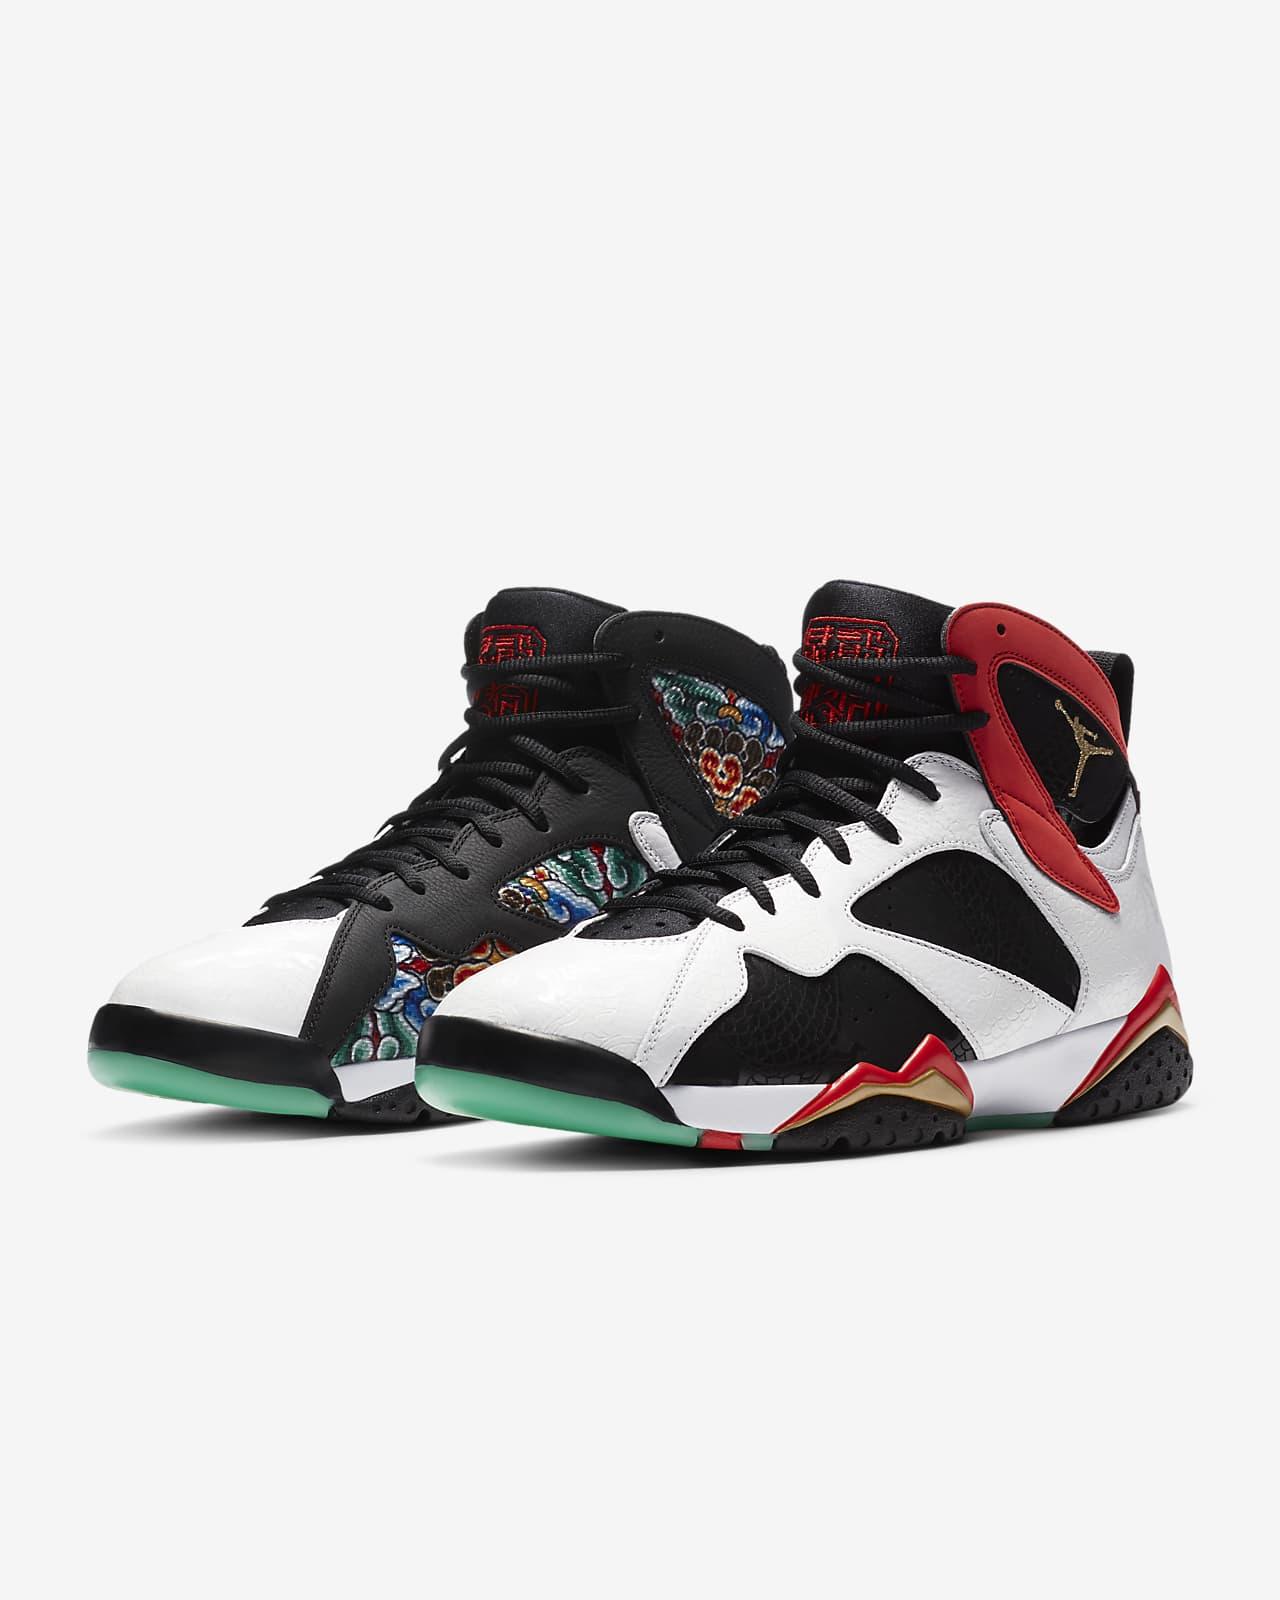 corona Madison Altitud  Air Jordan 7 Retro GC Men's Shoe. Nike VN